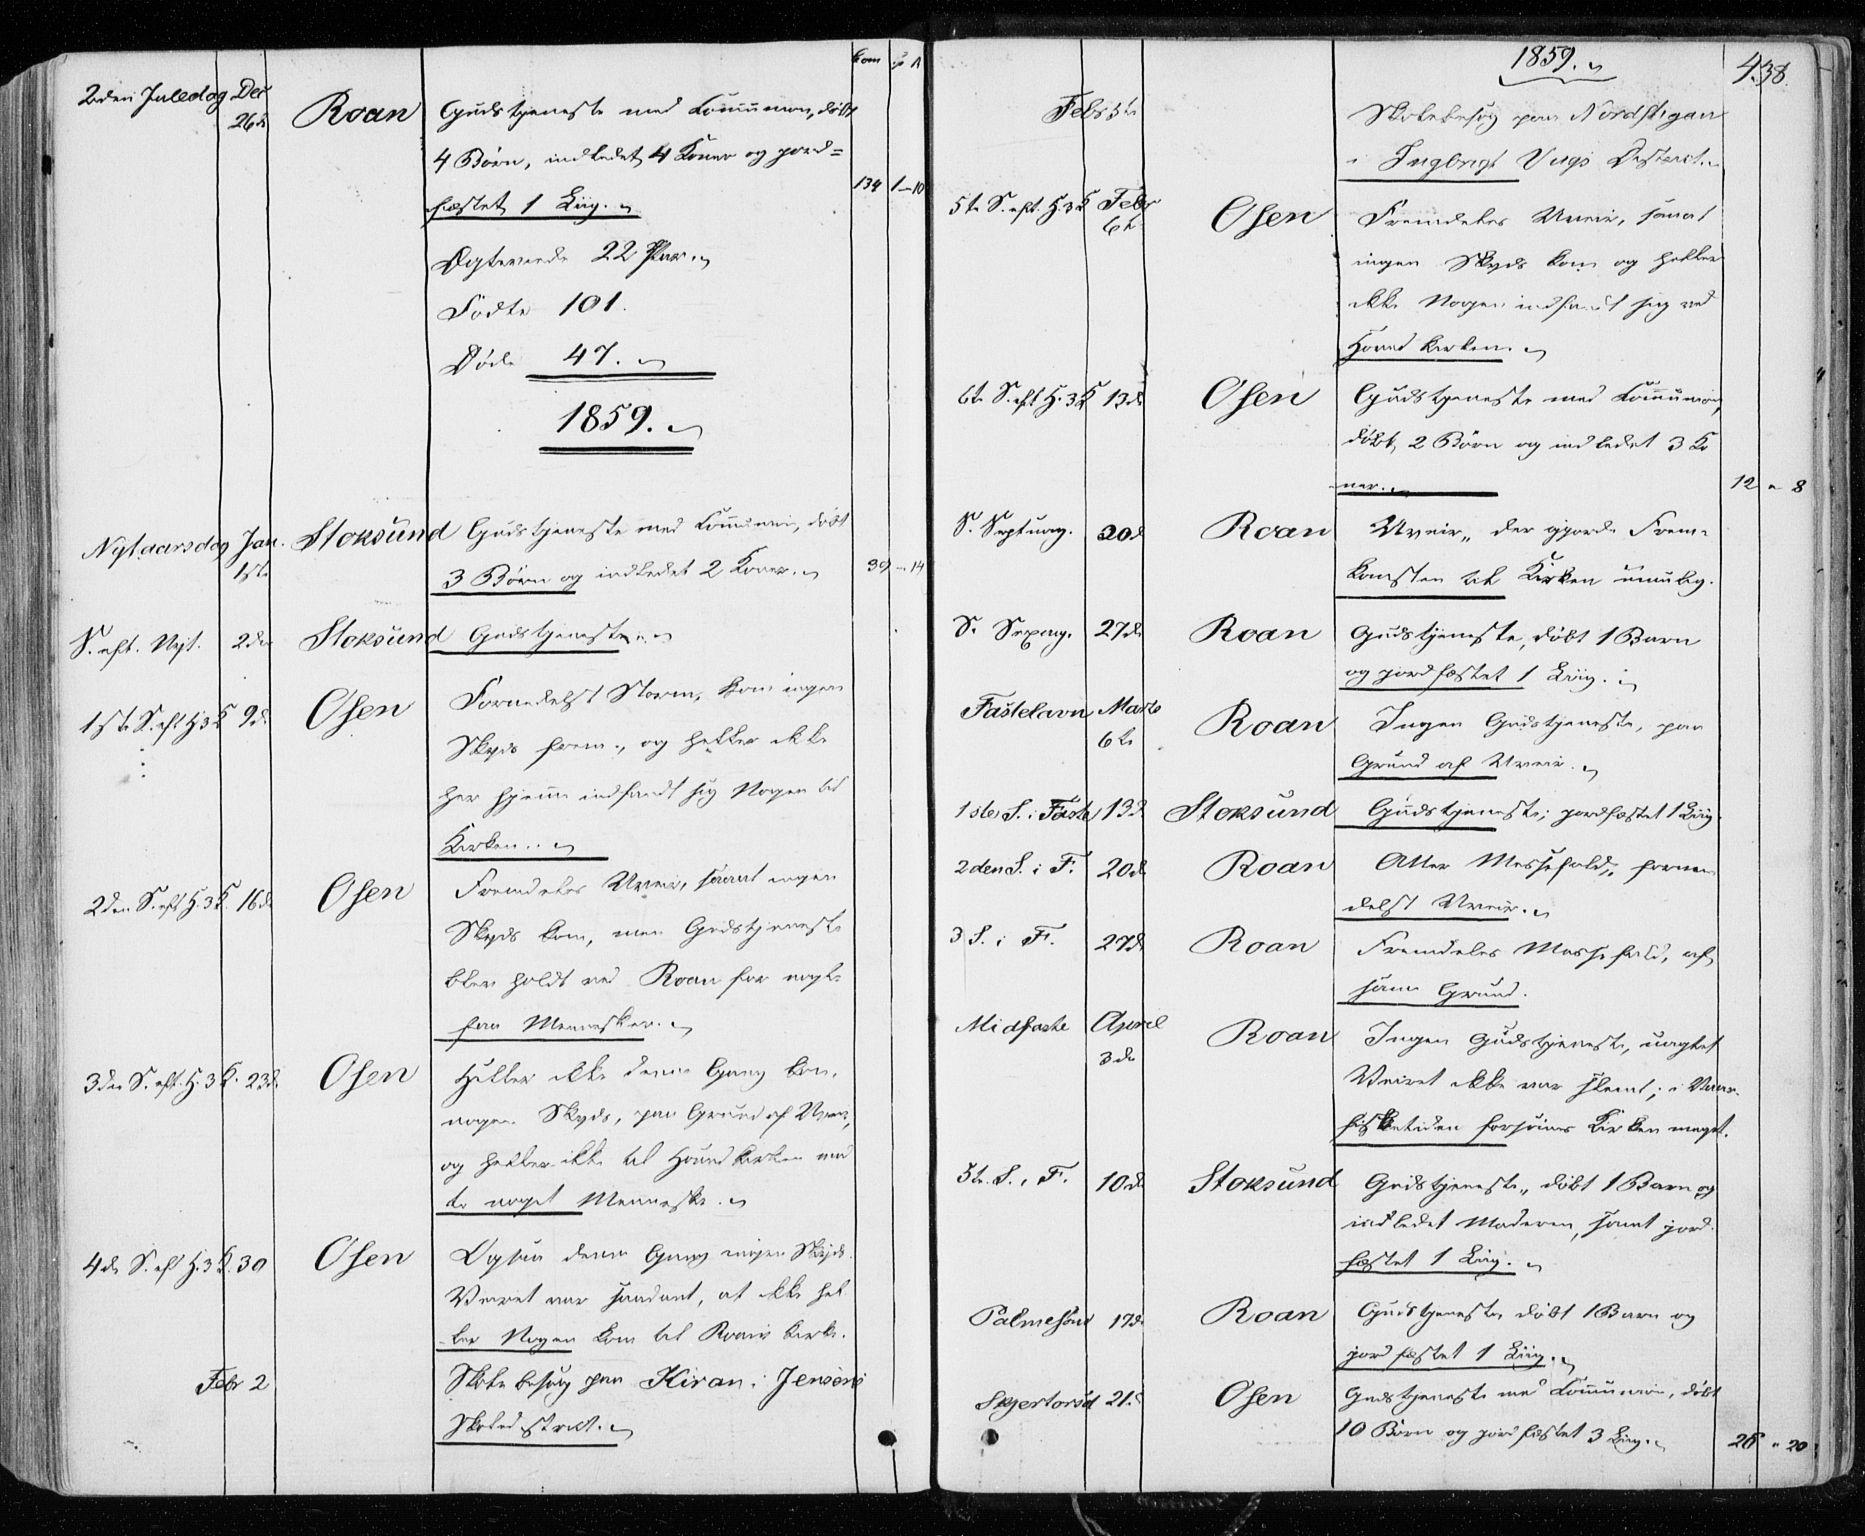 SAT, Ministerialprotokoller, klokkerbøker og fødselsregistre - Sør-Trøndelag, 657/L0705: Parish register (official) no. 657A06, 1858-1867, p. 438